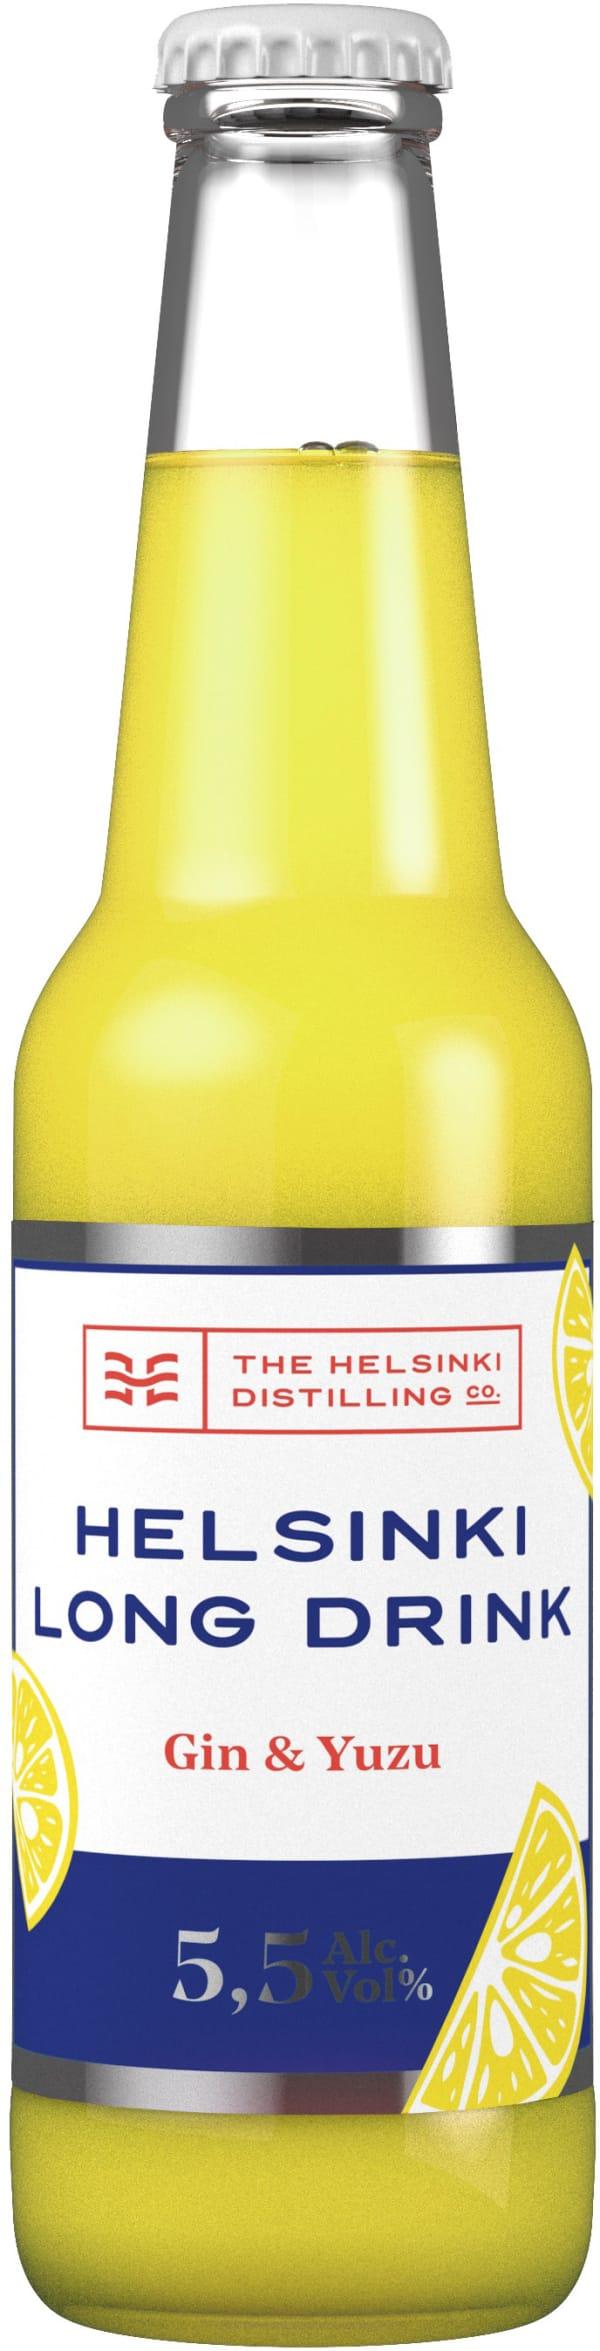 Helsinki Long Drink Gin & Yuzu